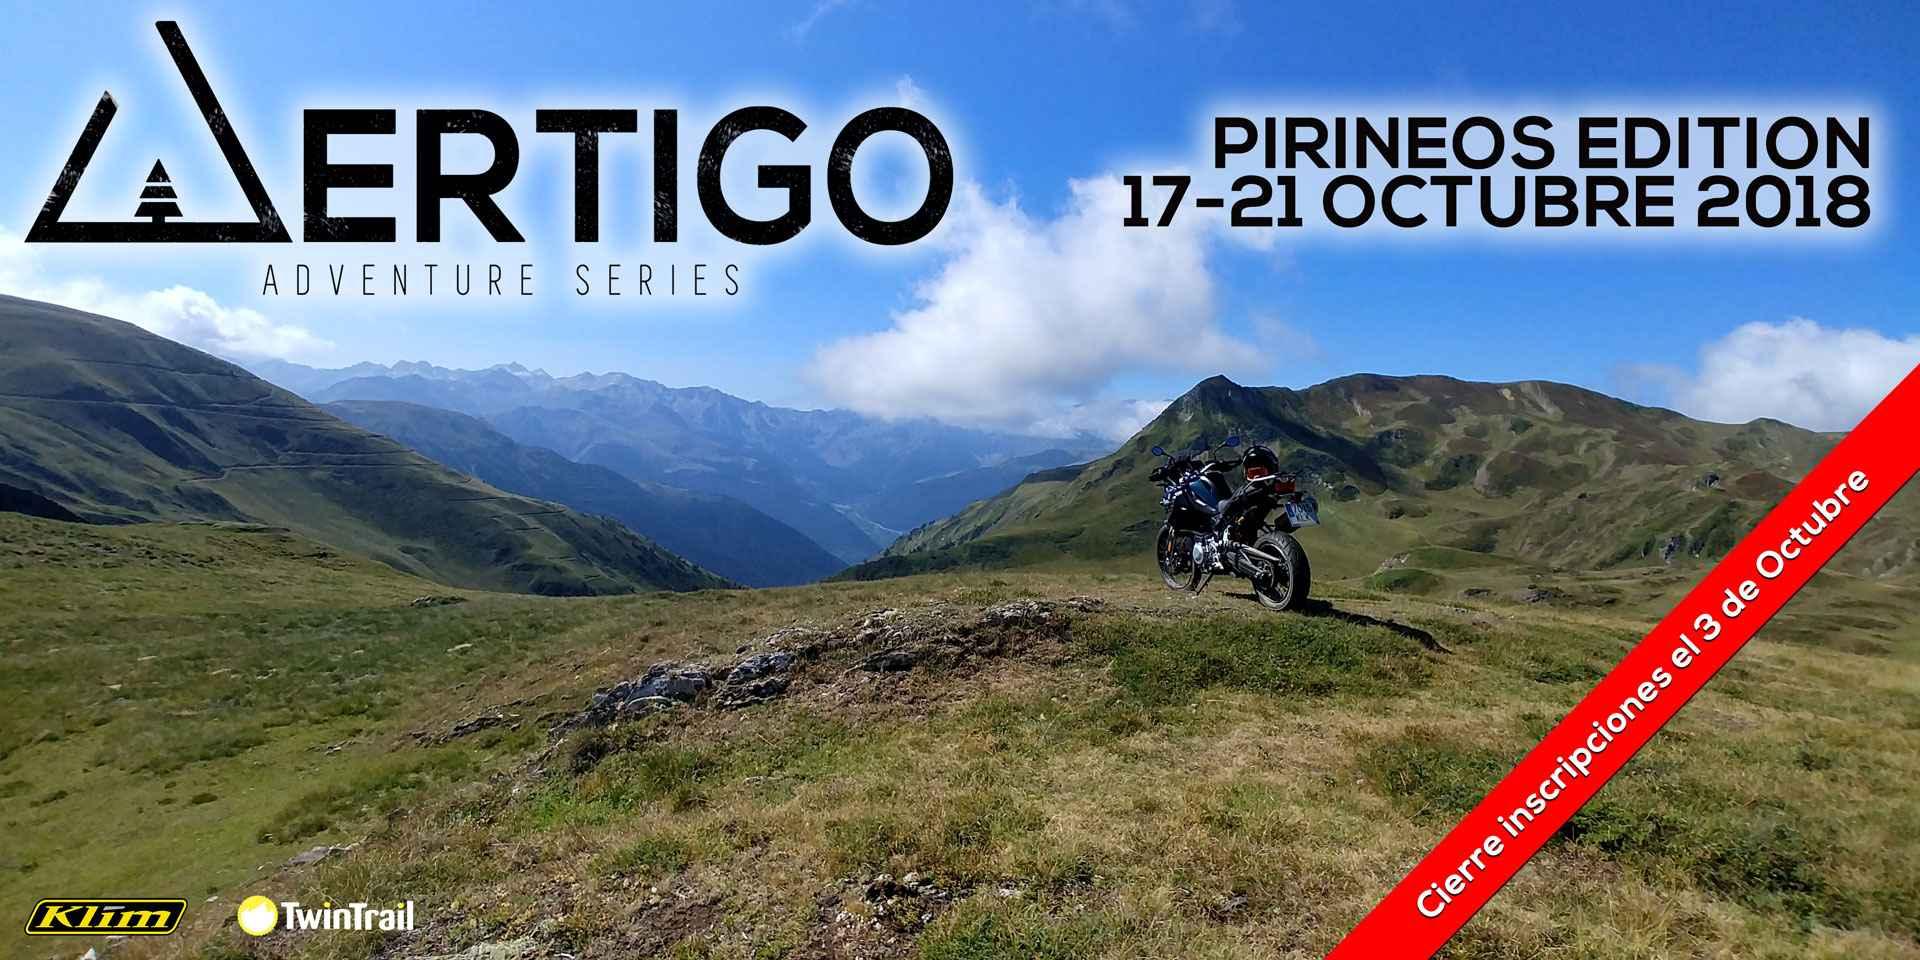 Vertigo Adventure Series - Pirineo Edition 2018